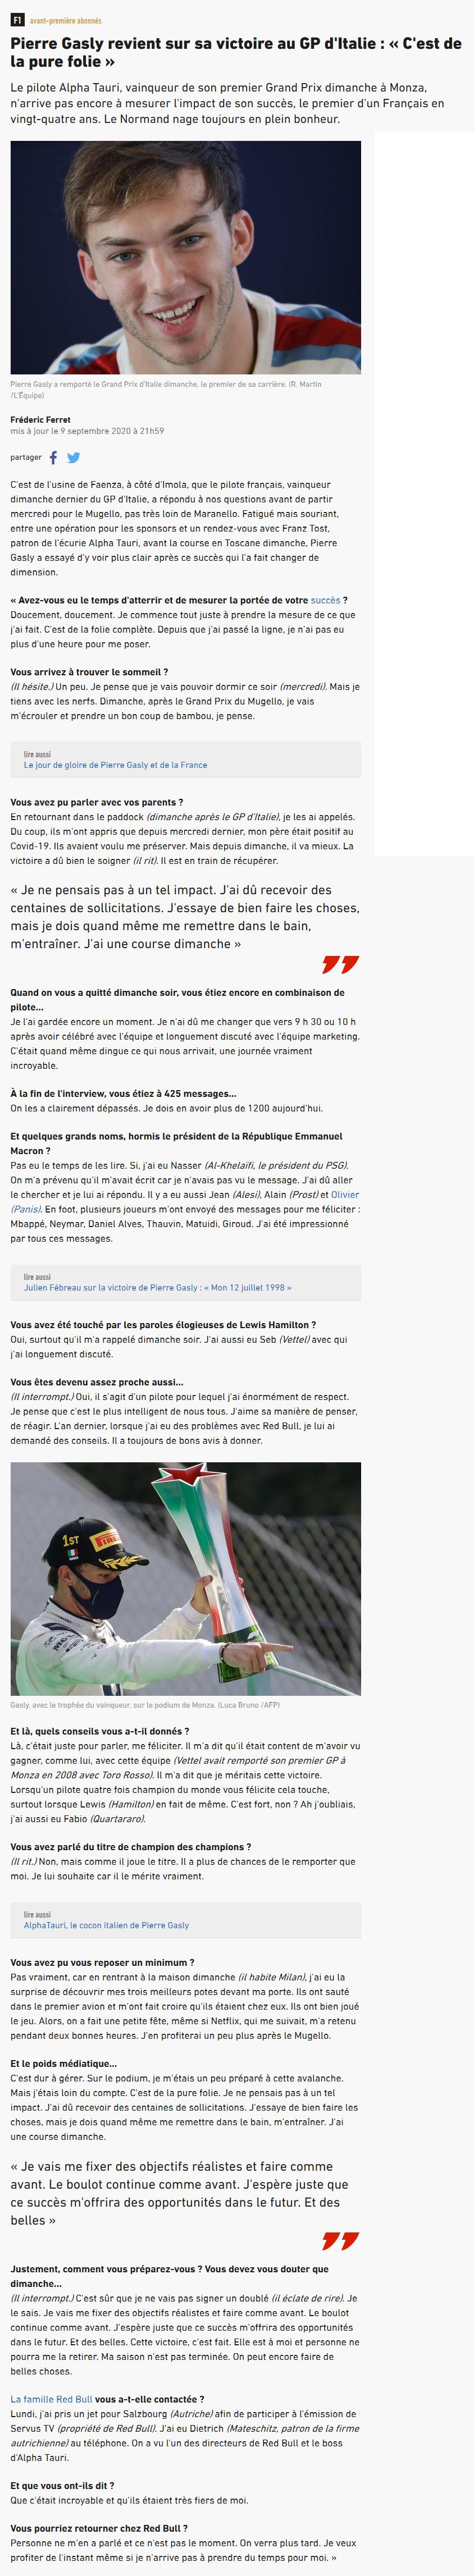 screenshot-www lequipe fr 2020-09-10 13-26-56